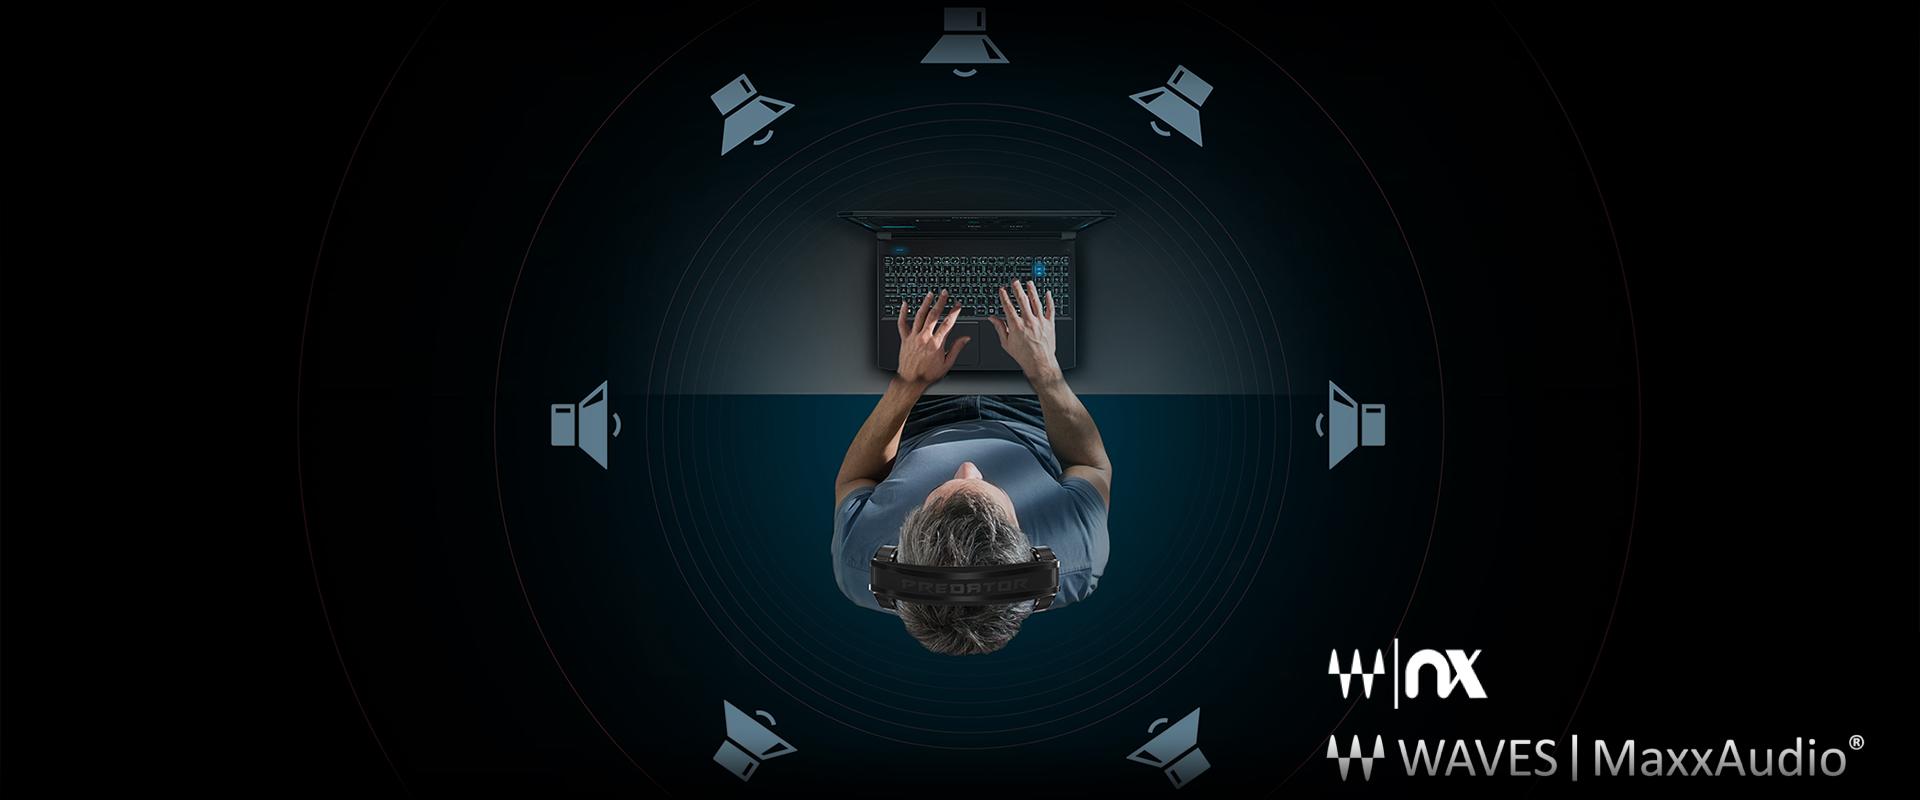 Predator Helios 300 | Laptops | Acer Australia